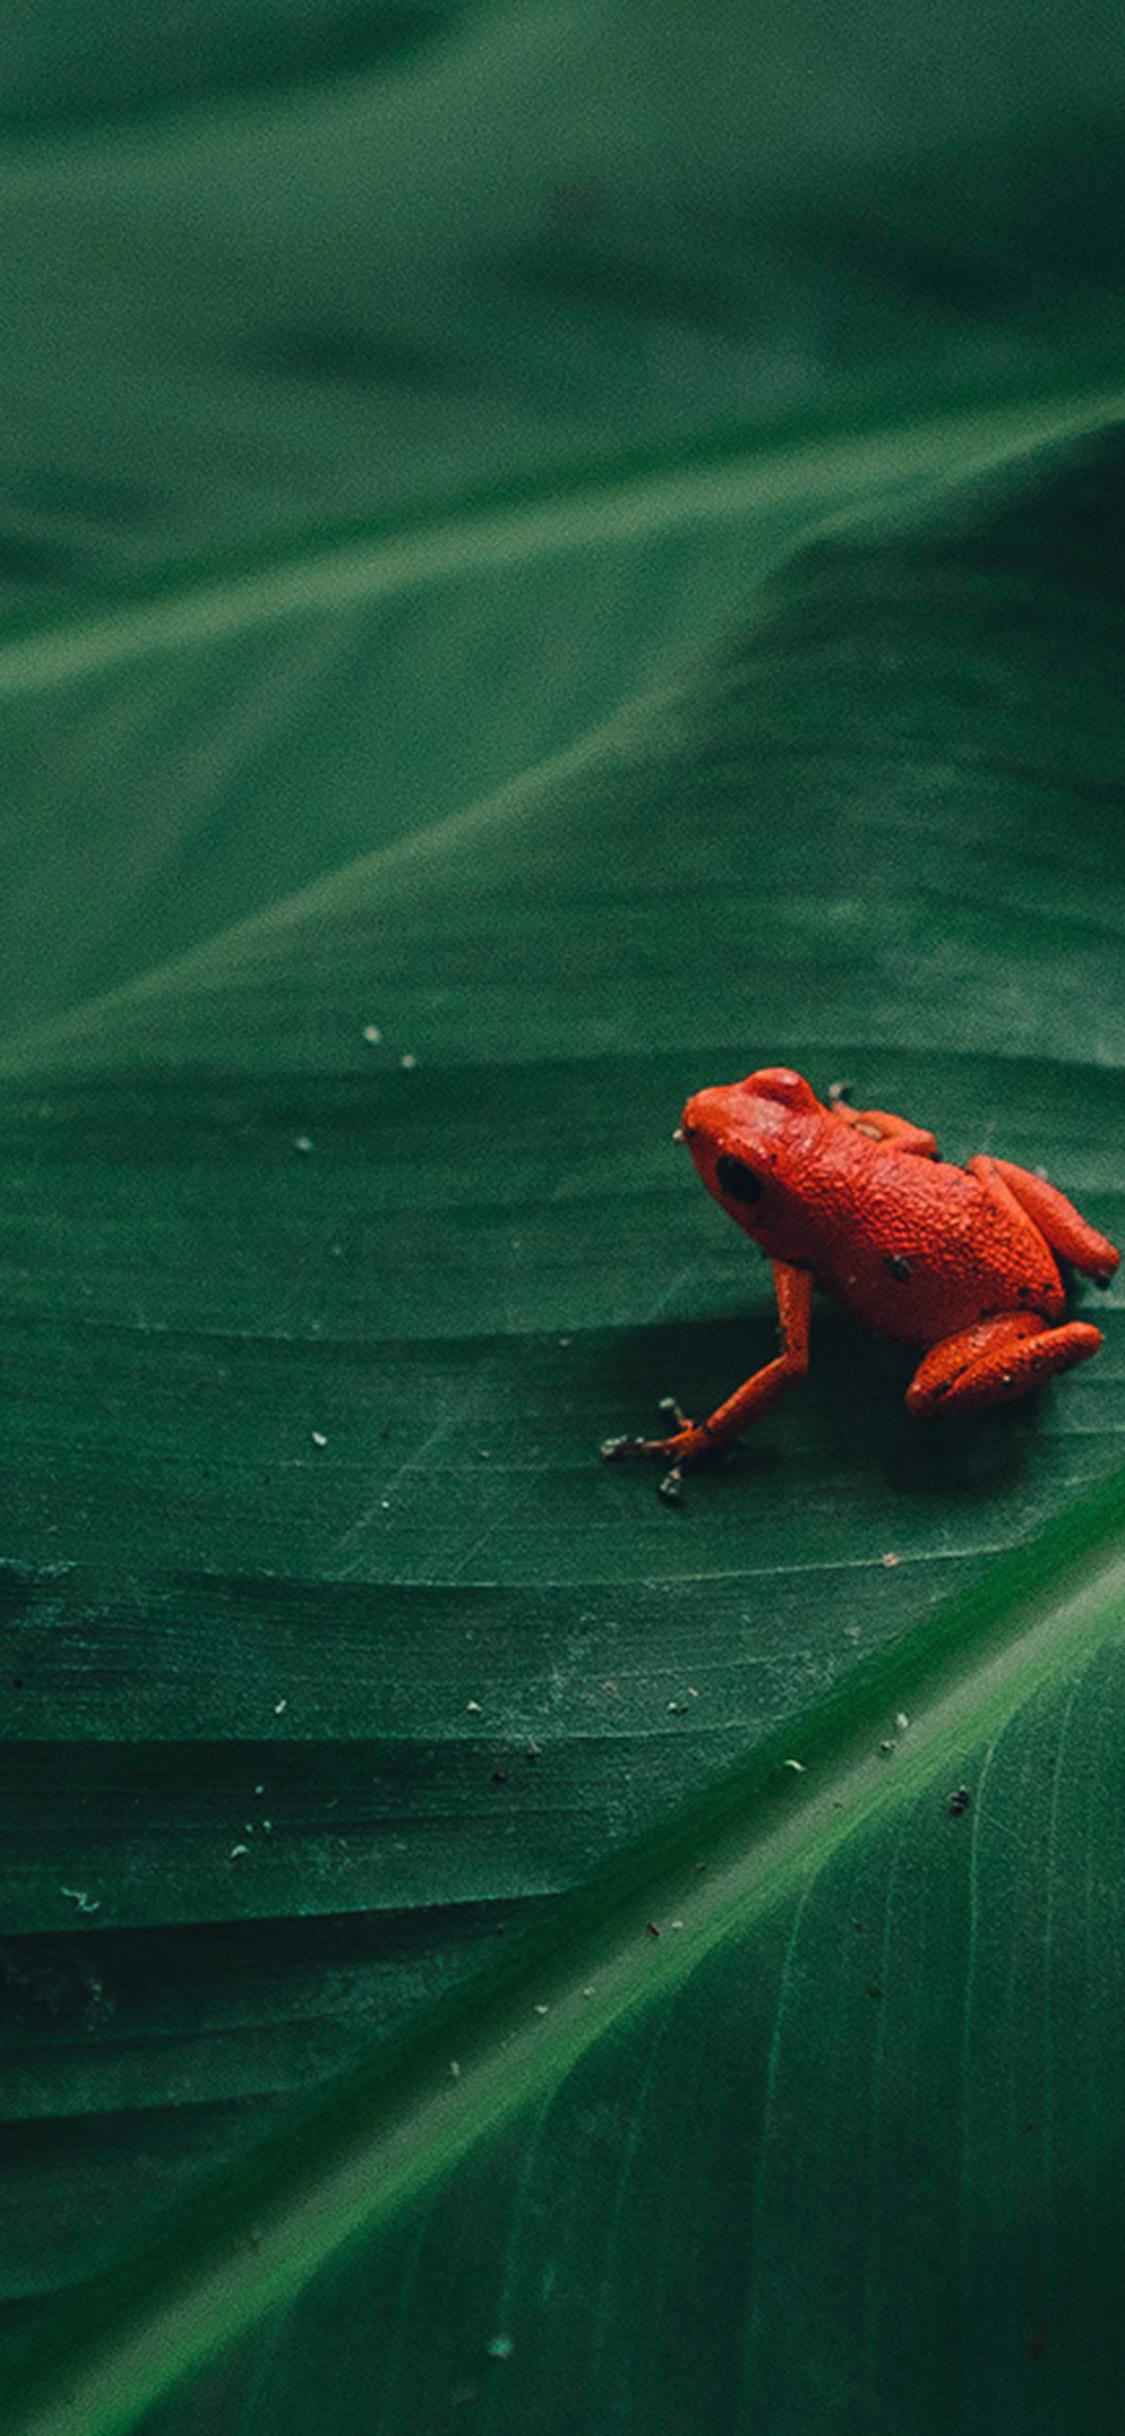 iPhonexpapers.com-Apple-iPhone-wallpaper-bi17-frog-leaf-red-nature-art